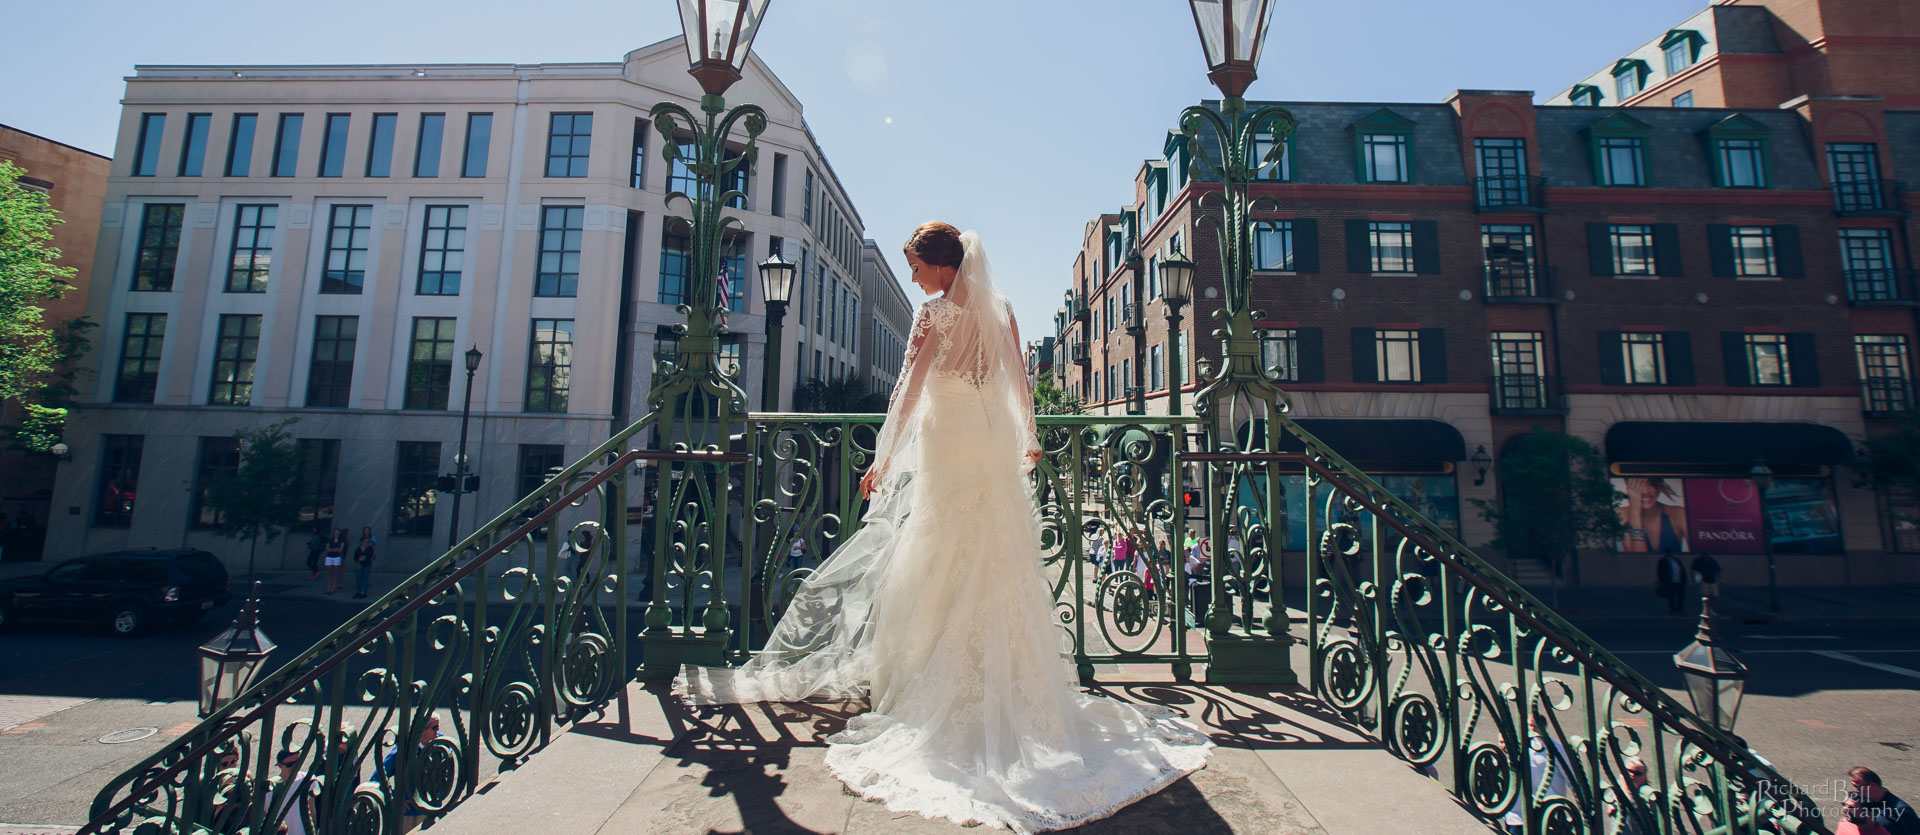 Melissa Downtown Charleston